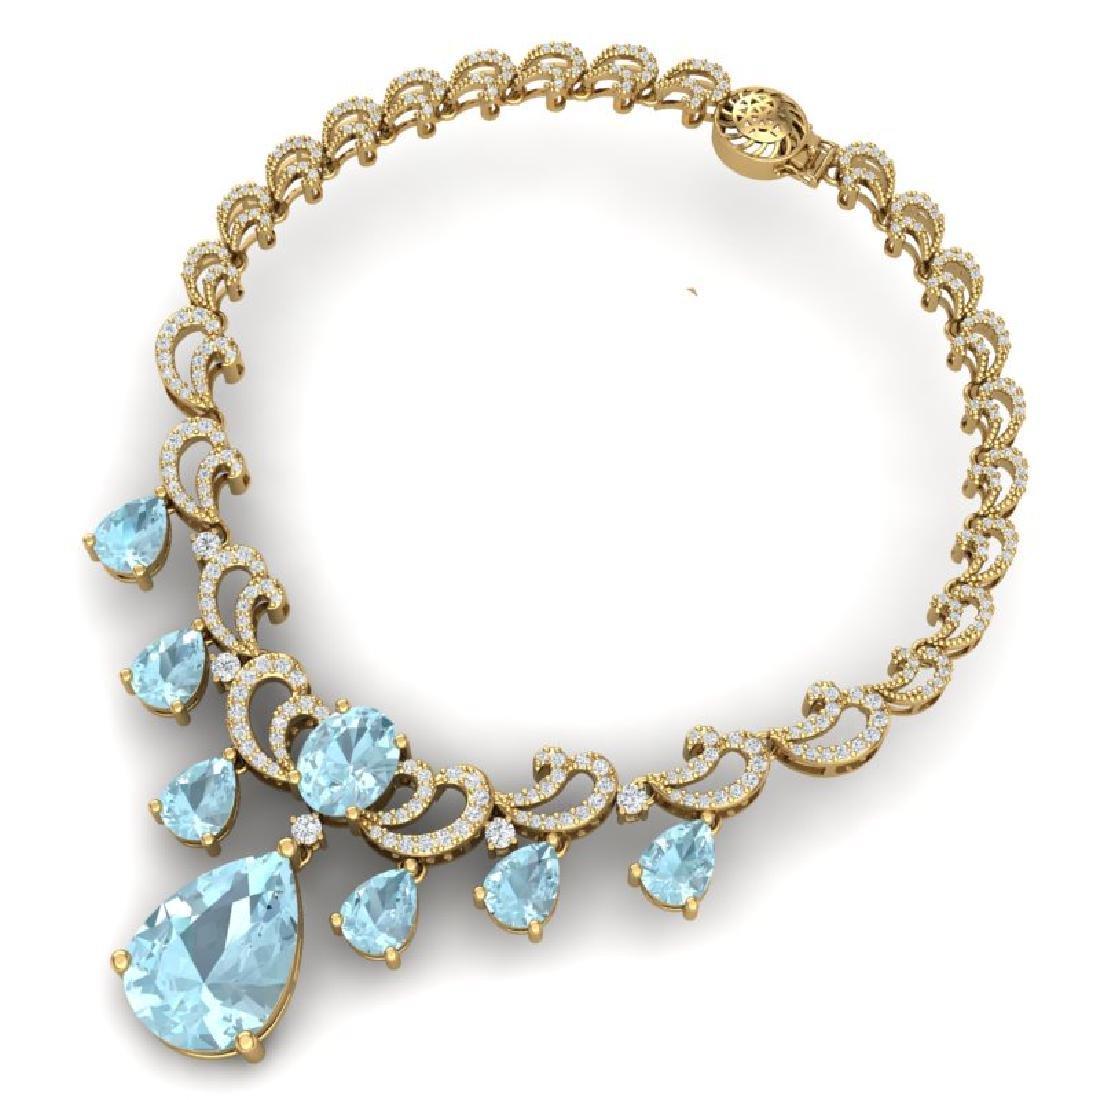 34.69 CTW Royalty Sky Topaz & VS Diamond Necklace 18K - 2